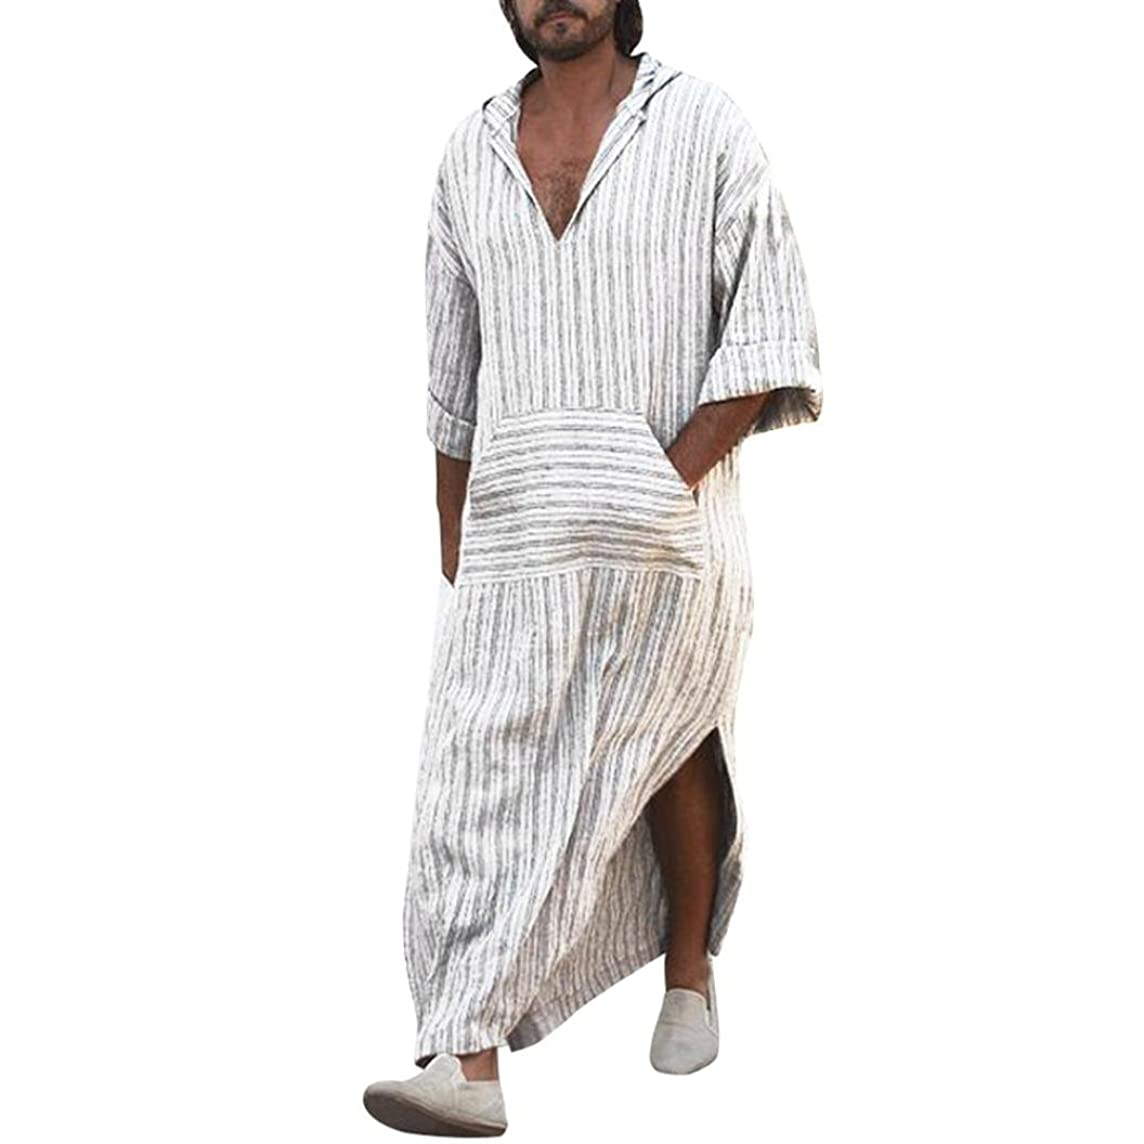 Mens Robes Long,Vanvler Male Long Sleeve Dress Shirt -Striped Blouse Hooded Vintage Casual Kaftan